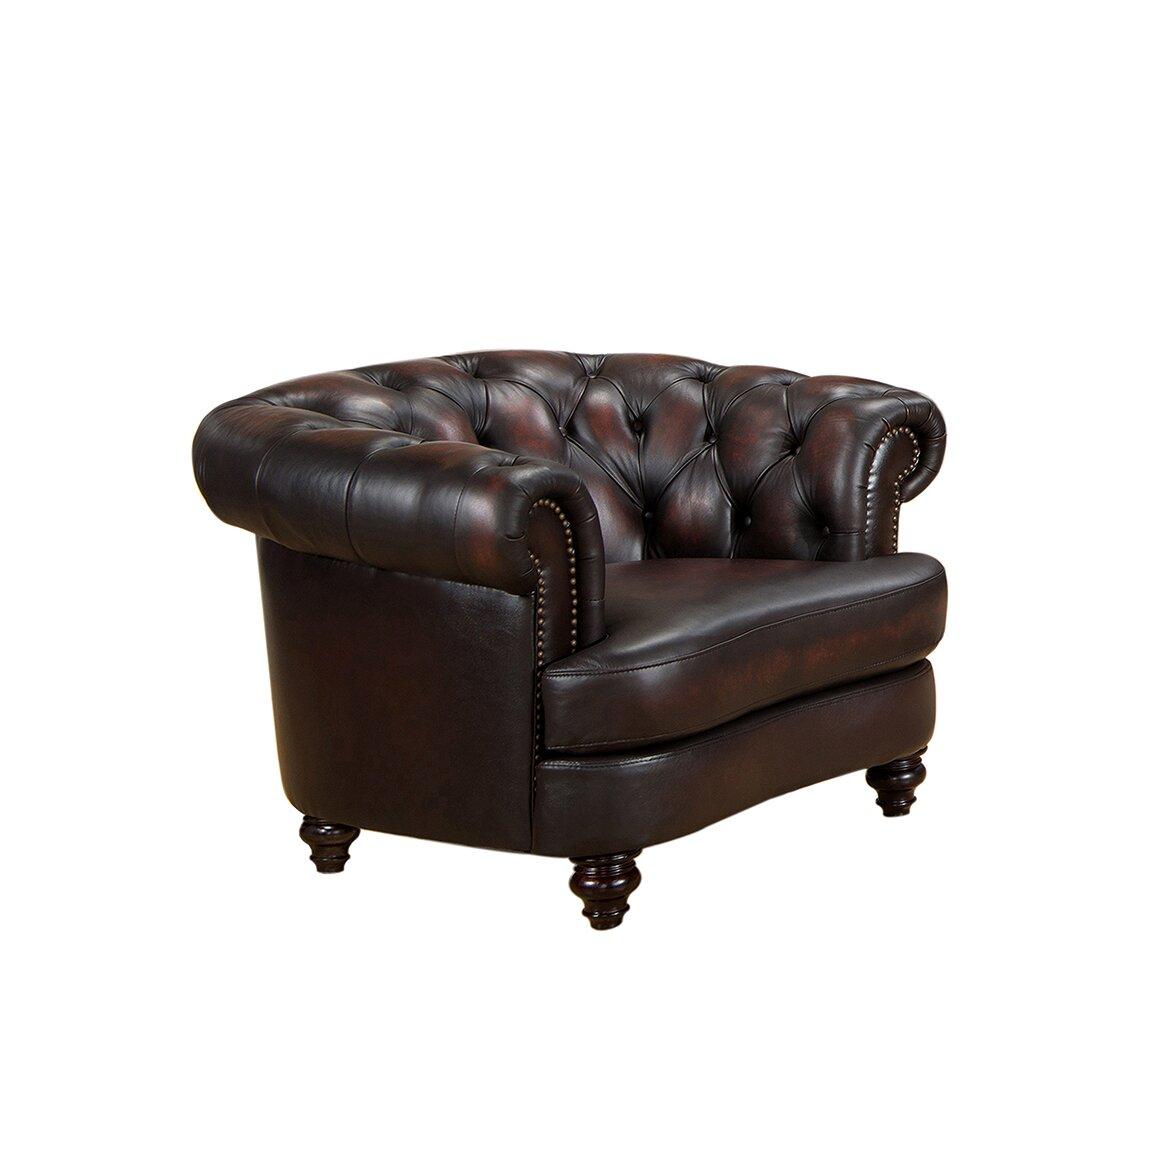 Leather Living Room Sets Amax Roosevelt 3 Piece Leather Living Room Set Reviews Wayfair